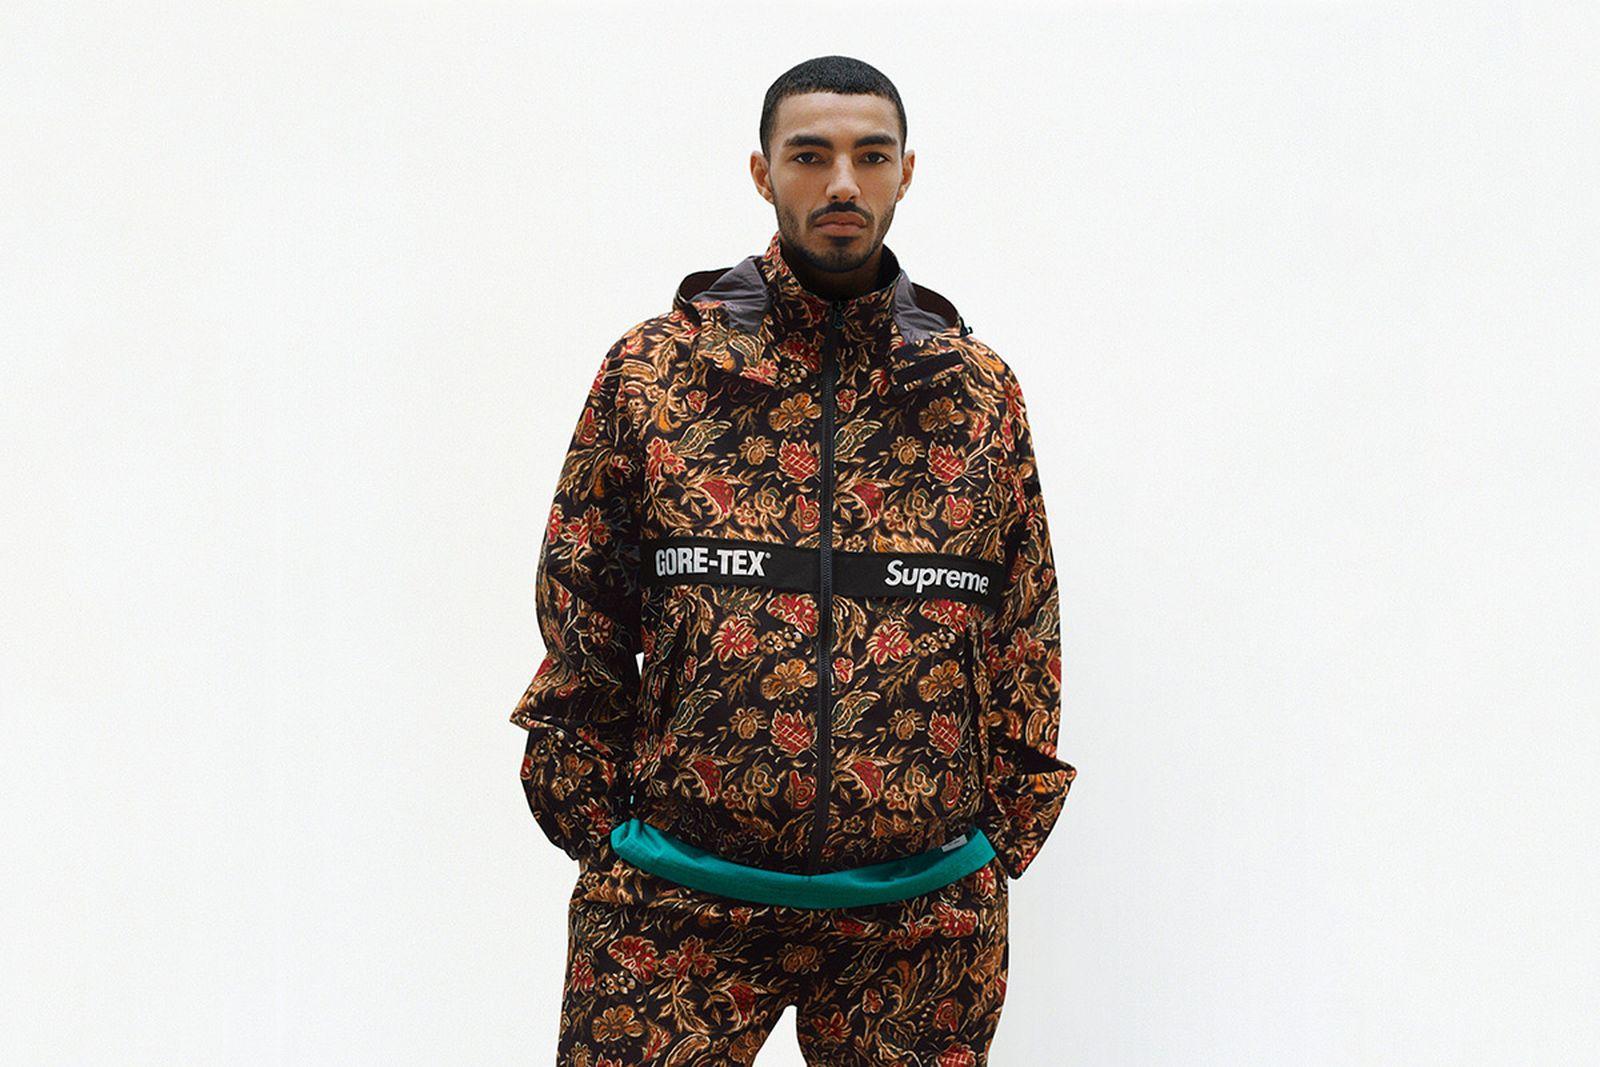 gore tex trend report main Adidas OFF-WHITE c/o Virgil Abloh Supreme